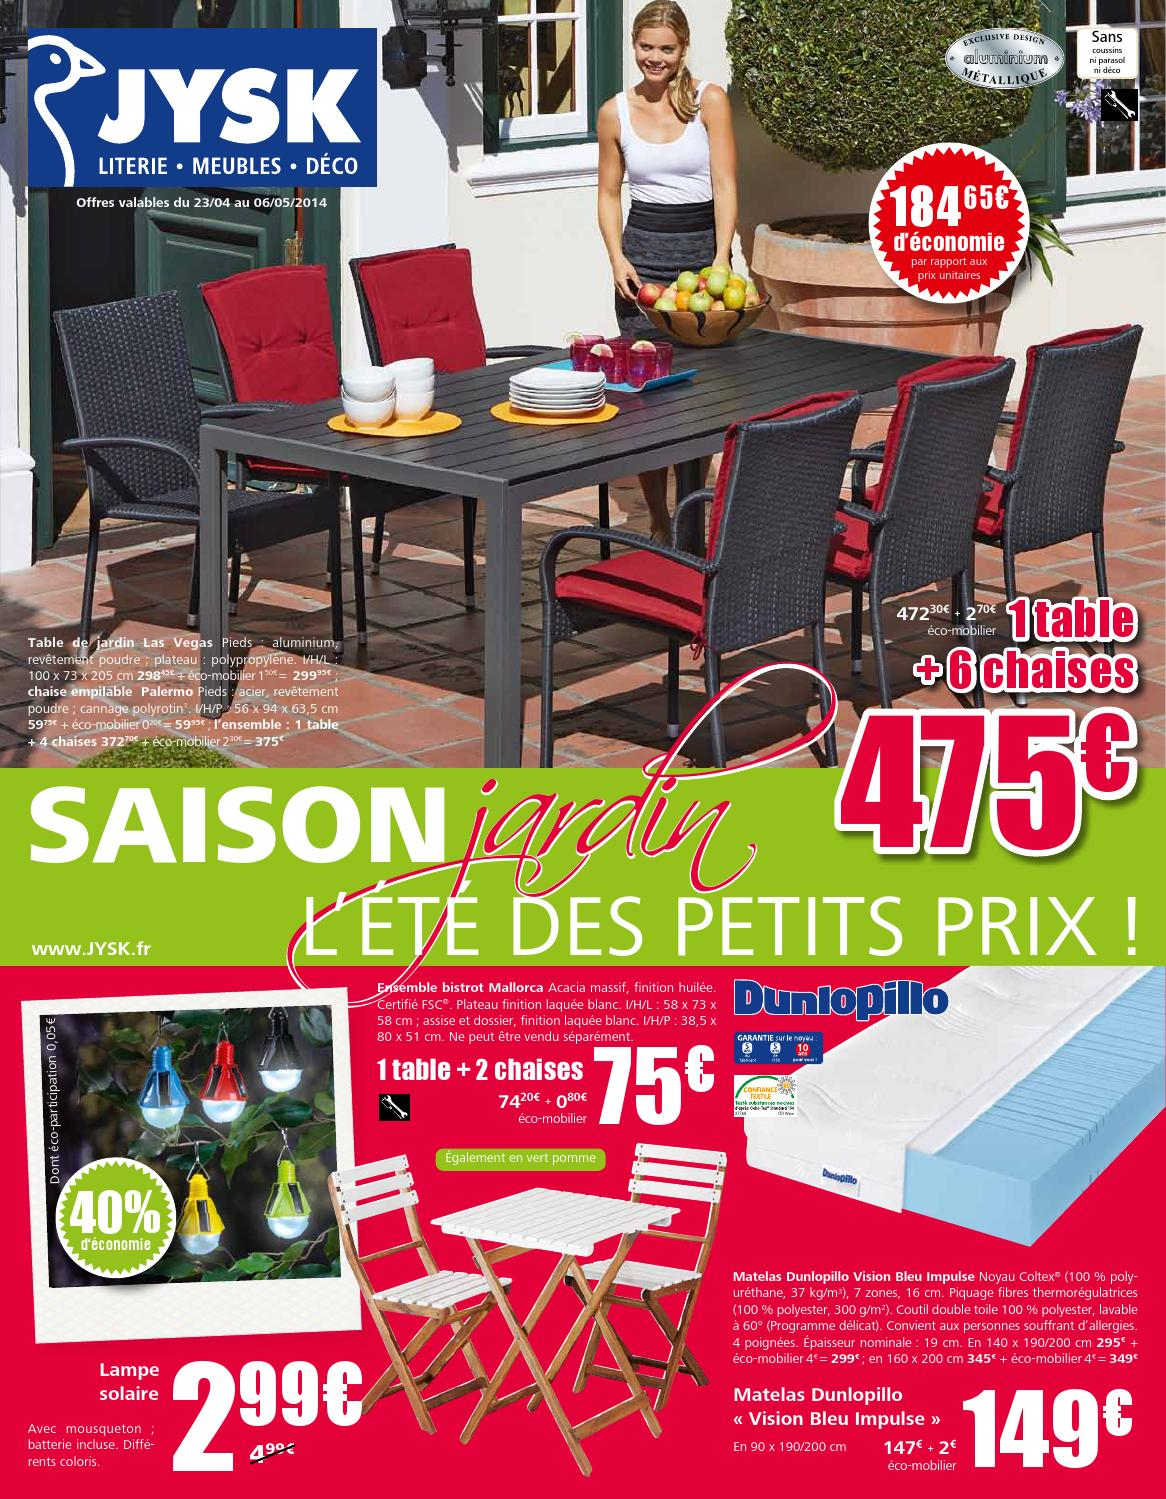 Catalogue jysk by joe monroe issuu for Jysk mallorca